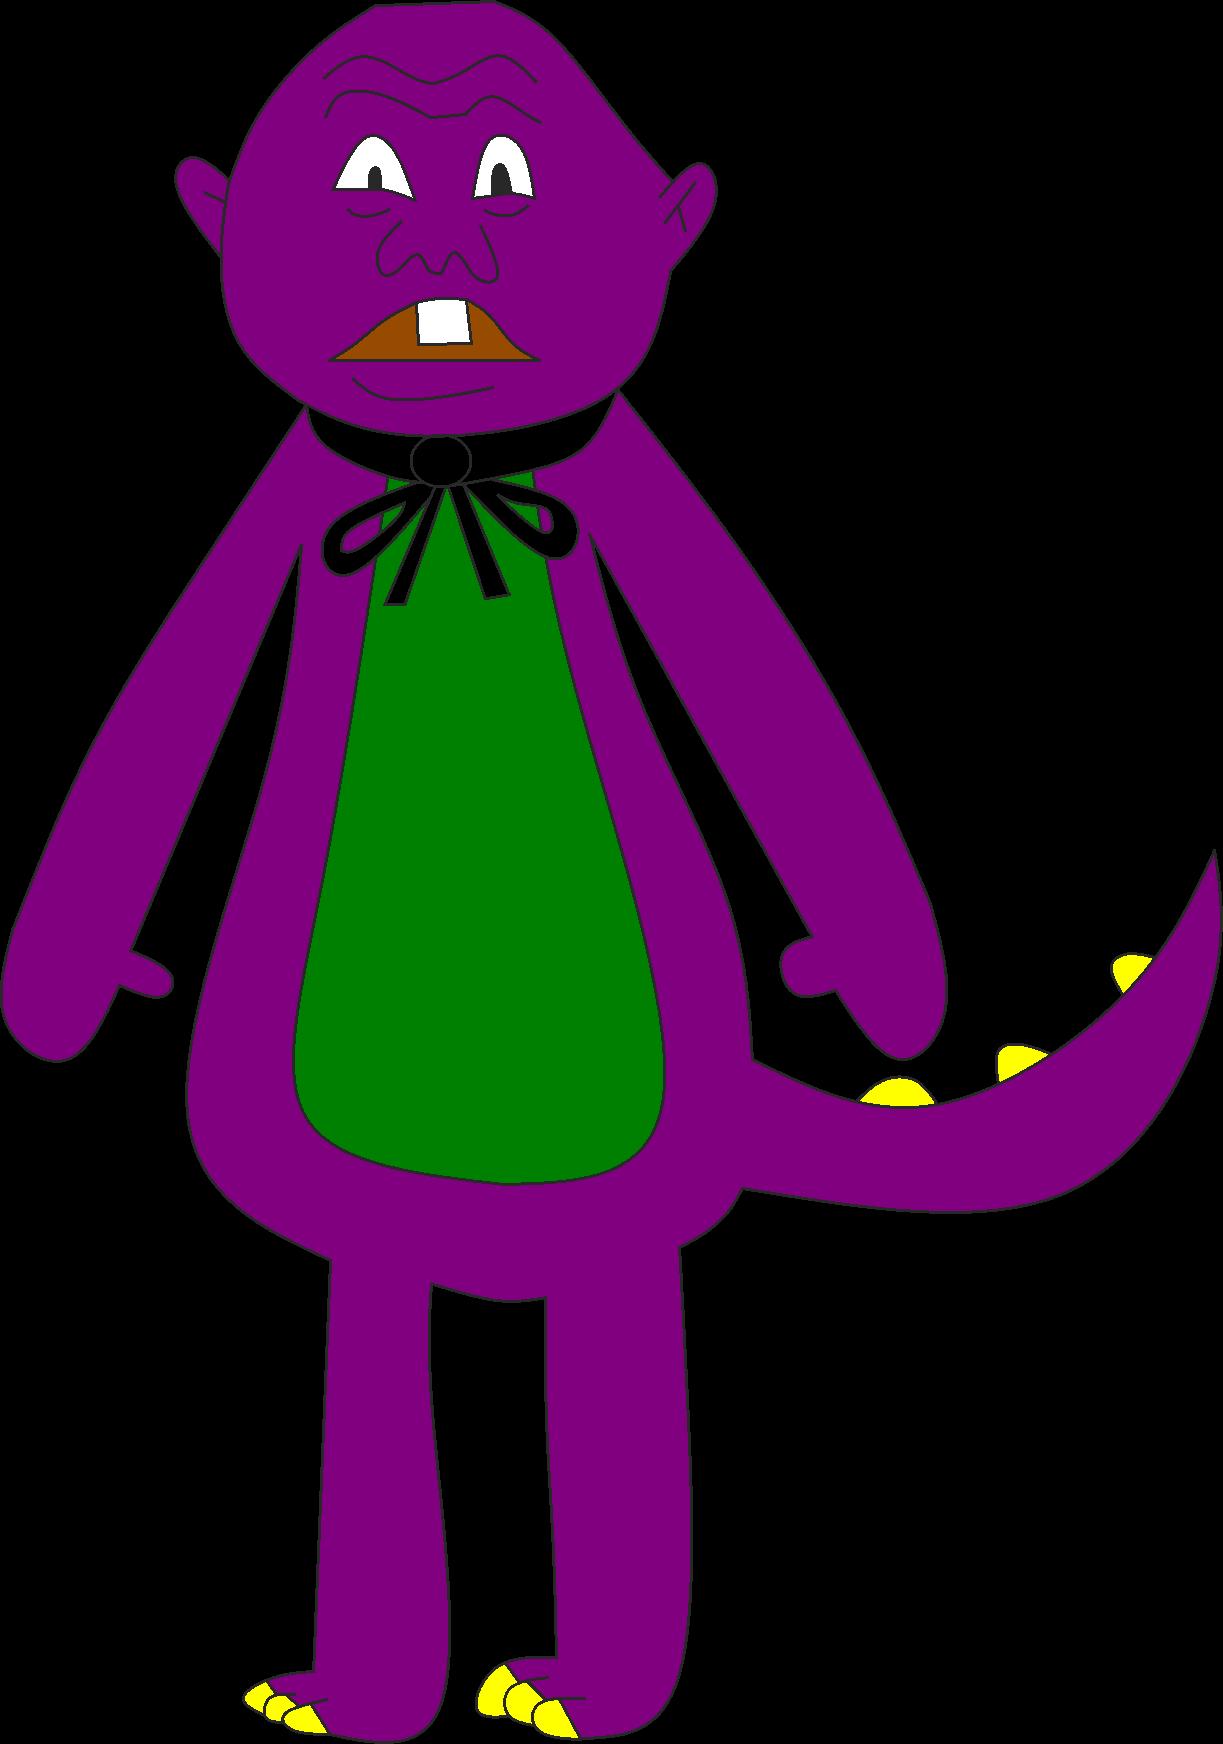 barney the pinhead dinosaur by sonic4hire on deviantart